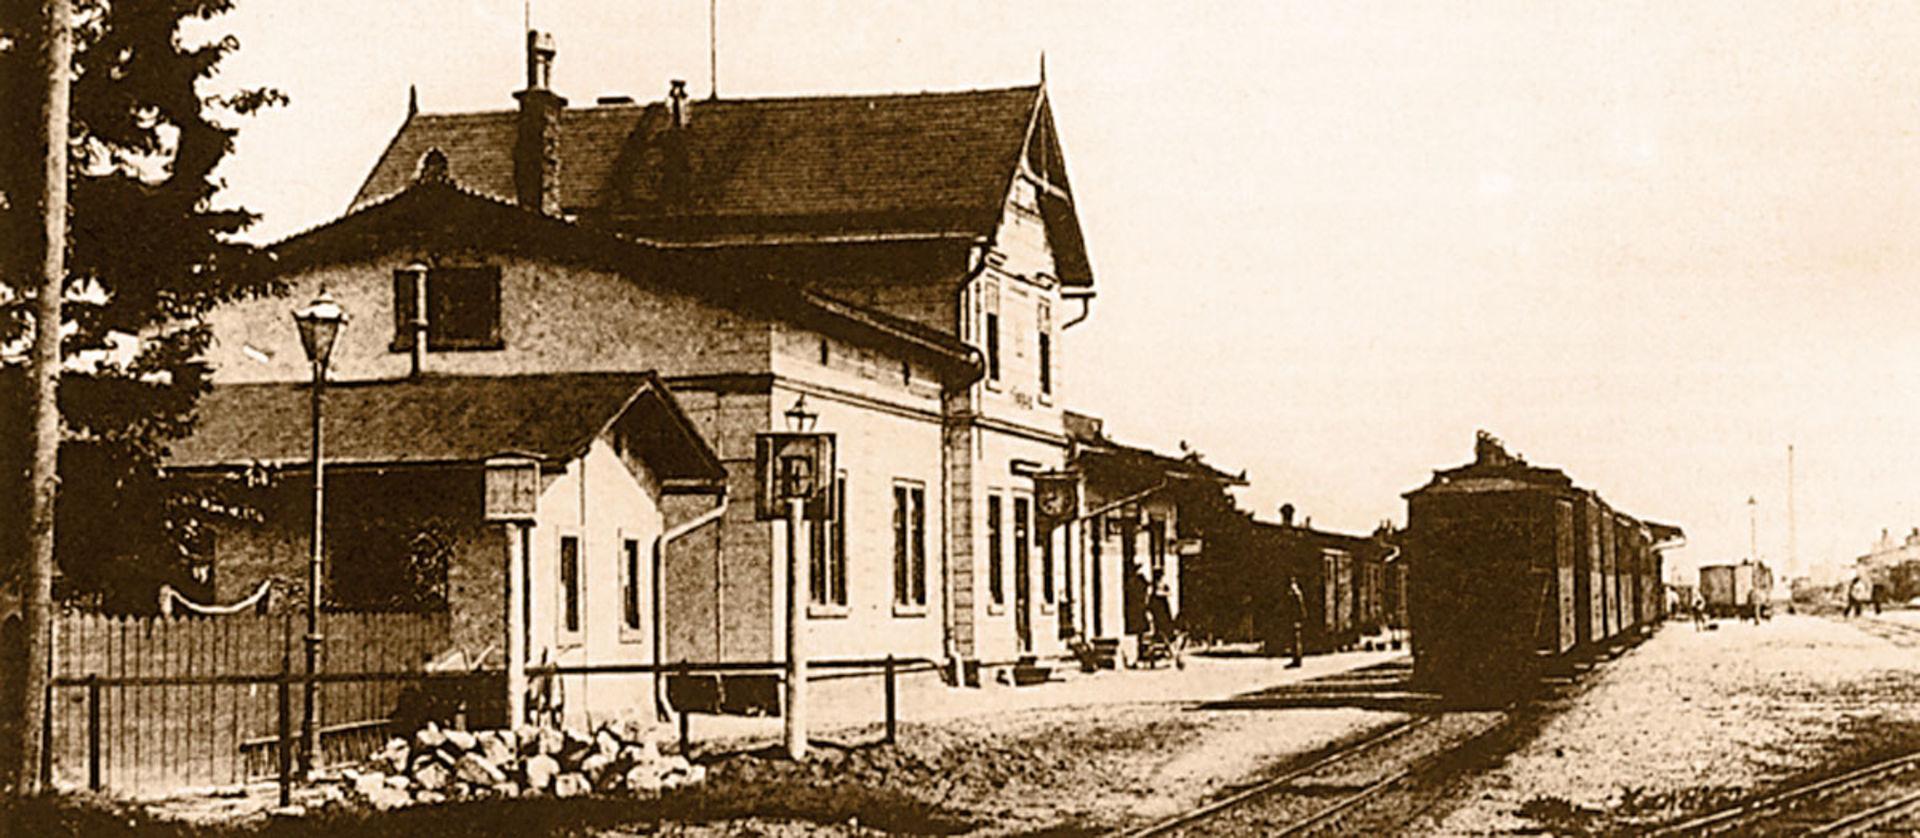 Historischer Bahnhof Mügeln.  © Sammlung A. Linz